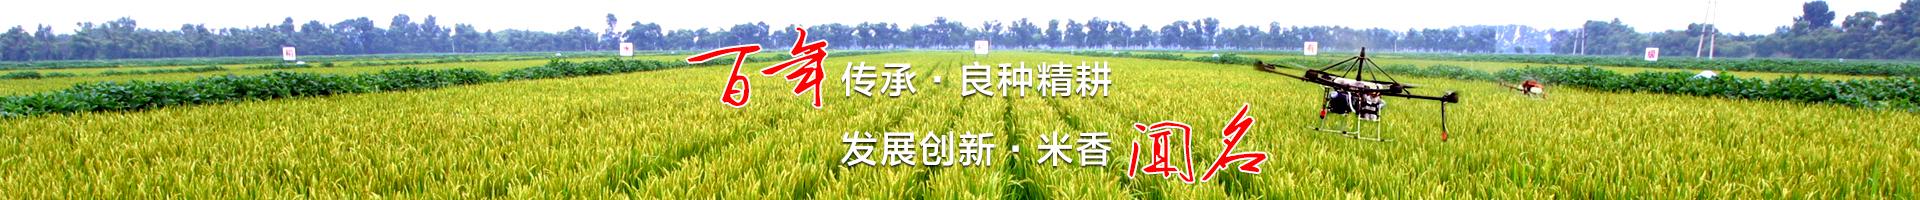 大米品质鉴别